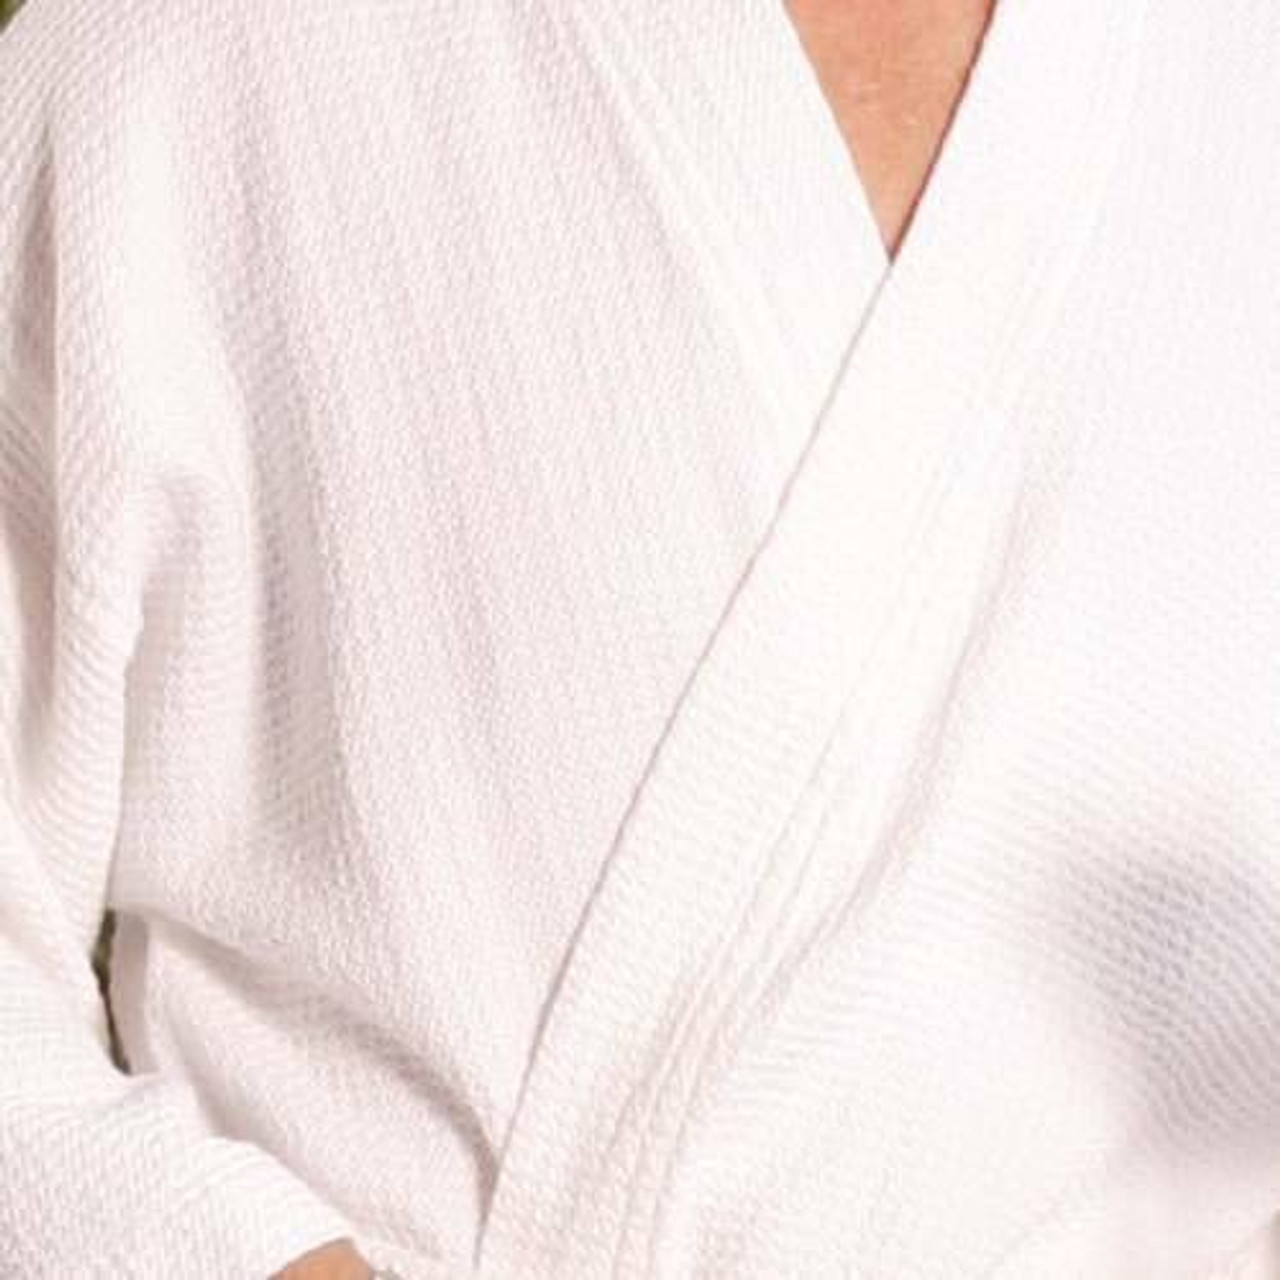 Ganesh Mills or Oxford Super Blend Ganesh Mills or Kimono Waffle Weave Bathrobe Ringspun or Pack of 12